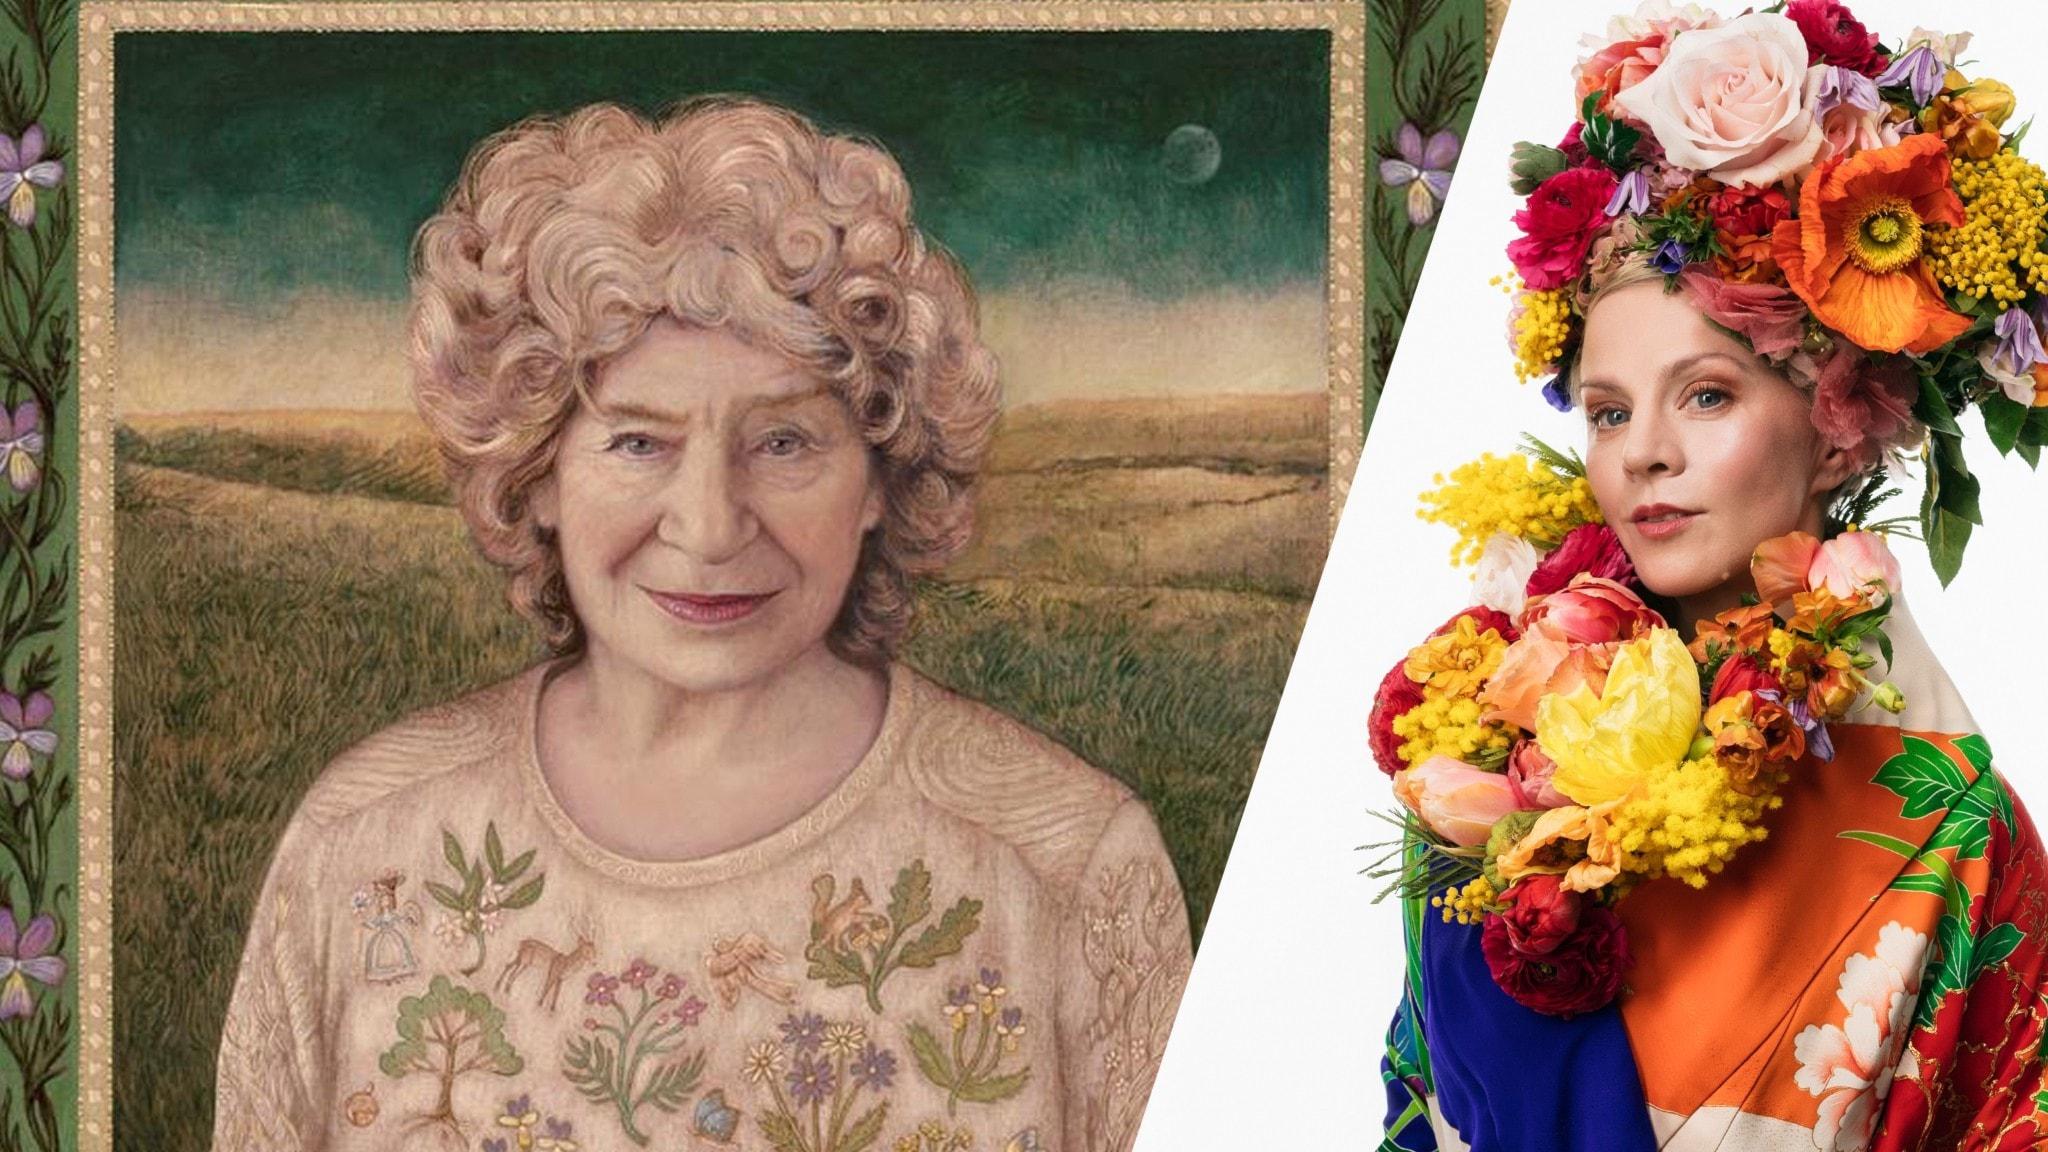 Artisten Shirley Collins och programledaren Esmeralda Moberg